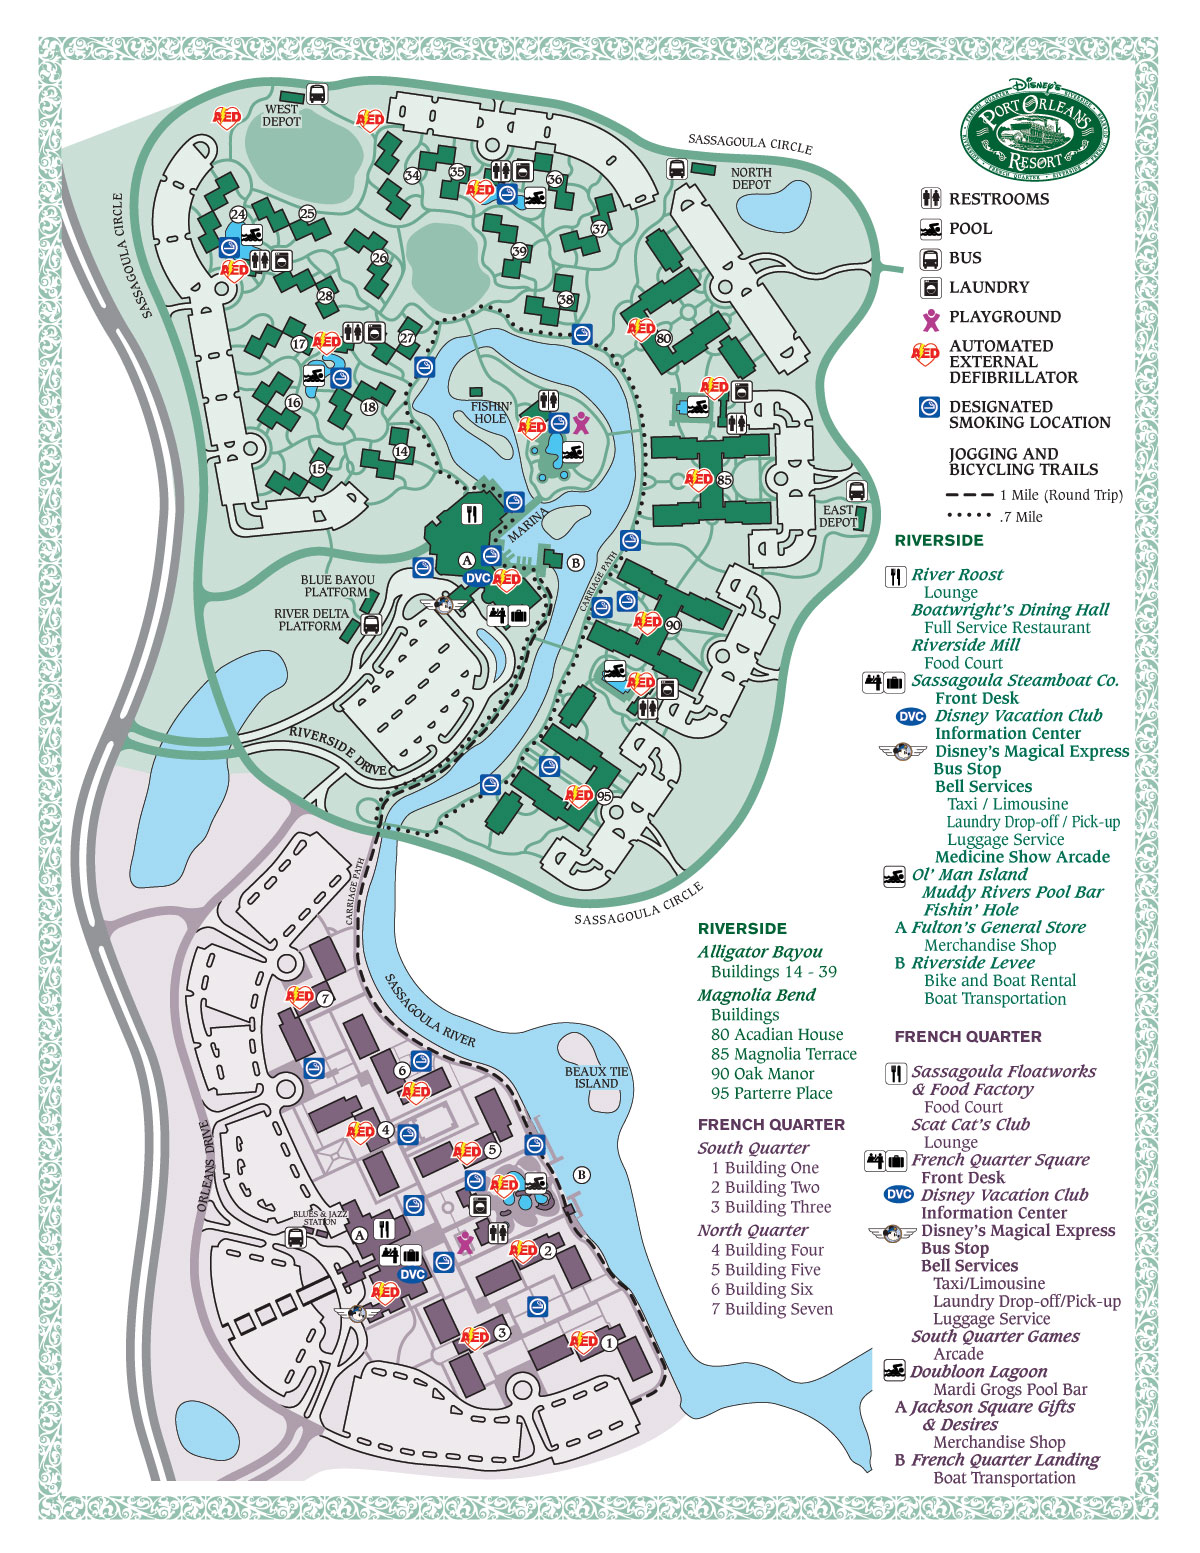 Running Trails at Walt Disney World Resorts | dadfordisney